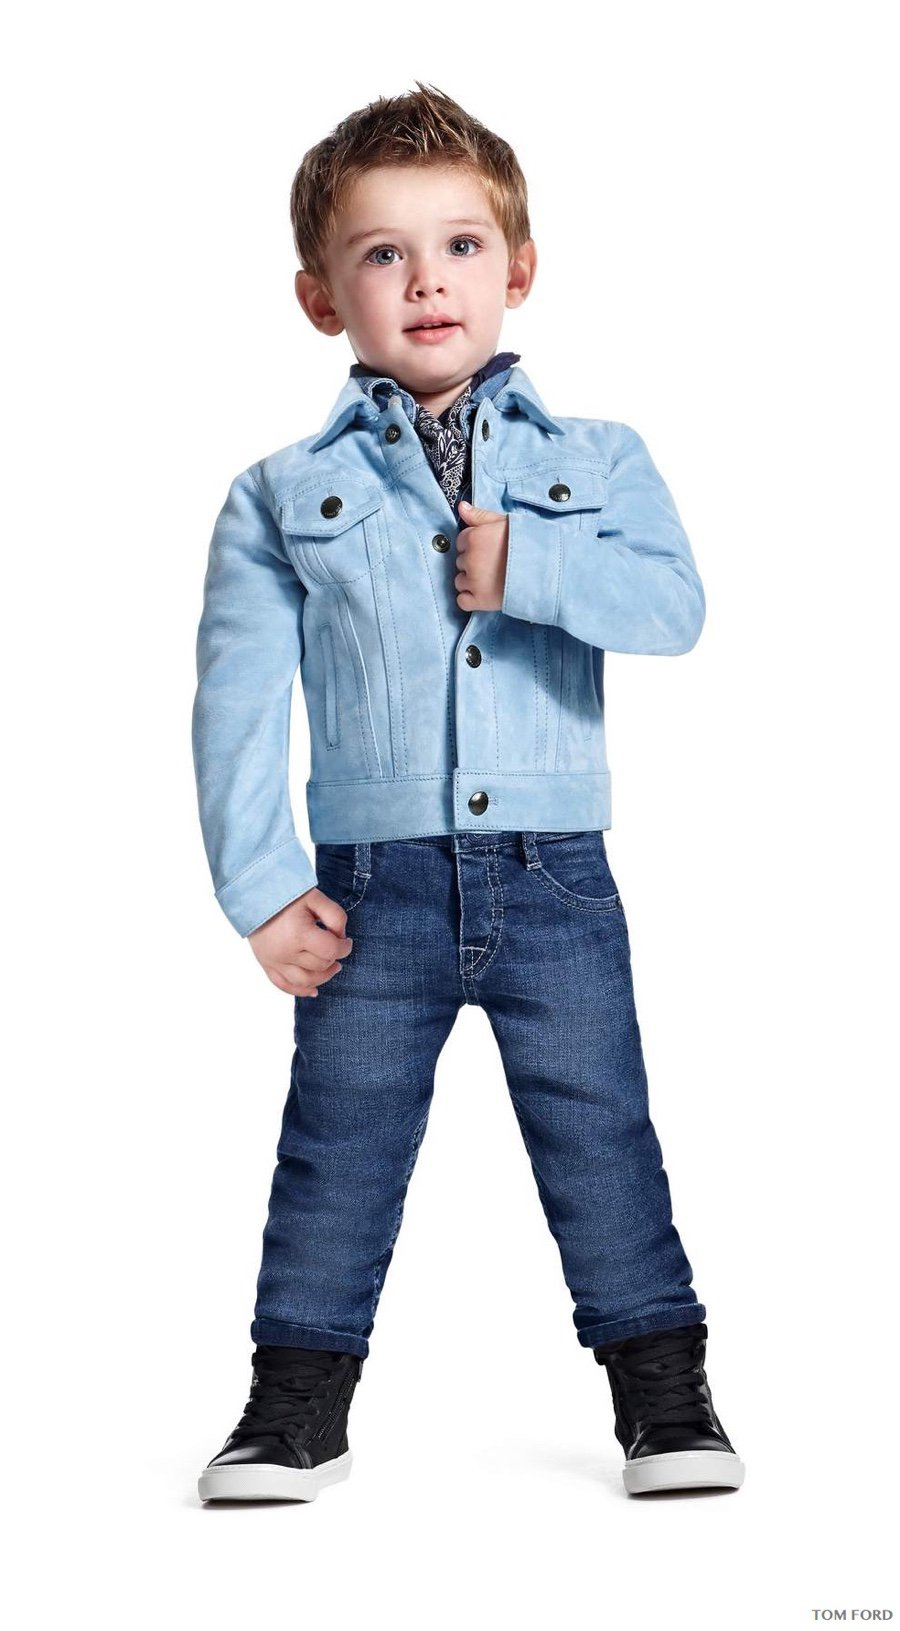 Tom Ford - Pale blue denim jacket in lightweight suede ($2,960)